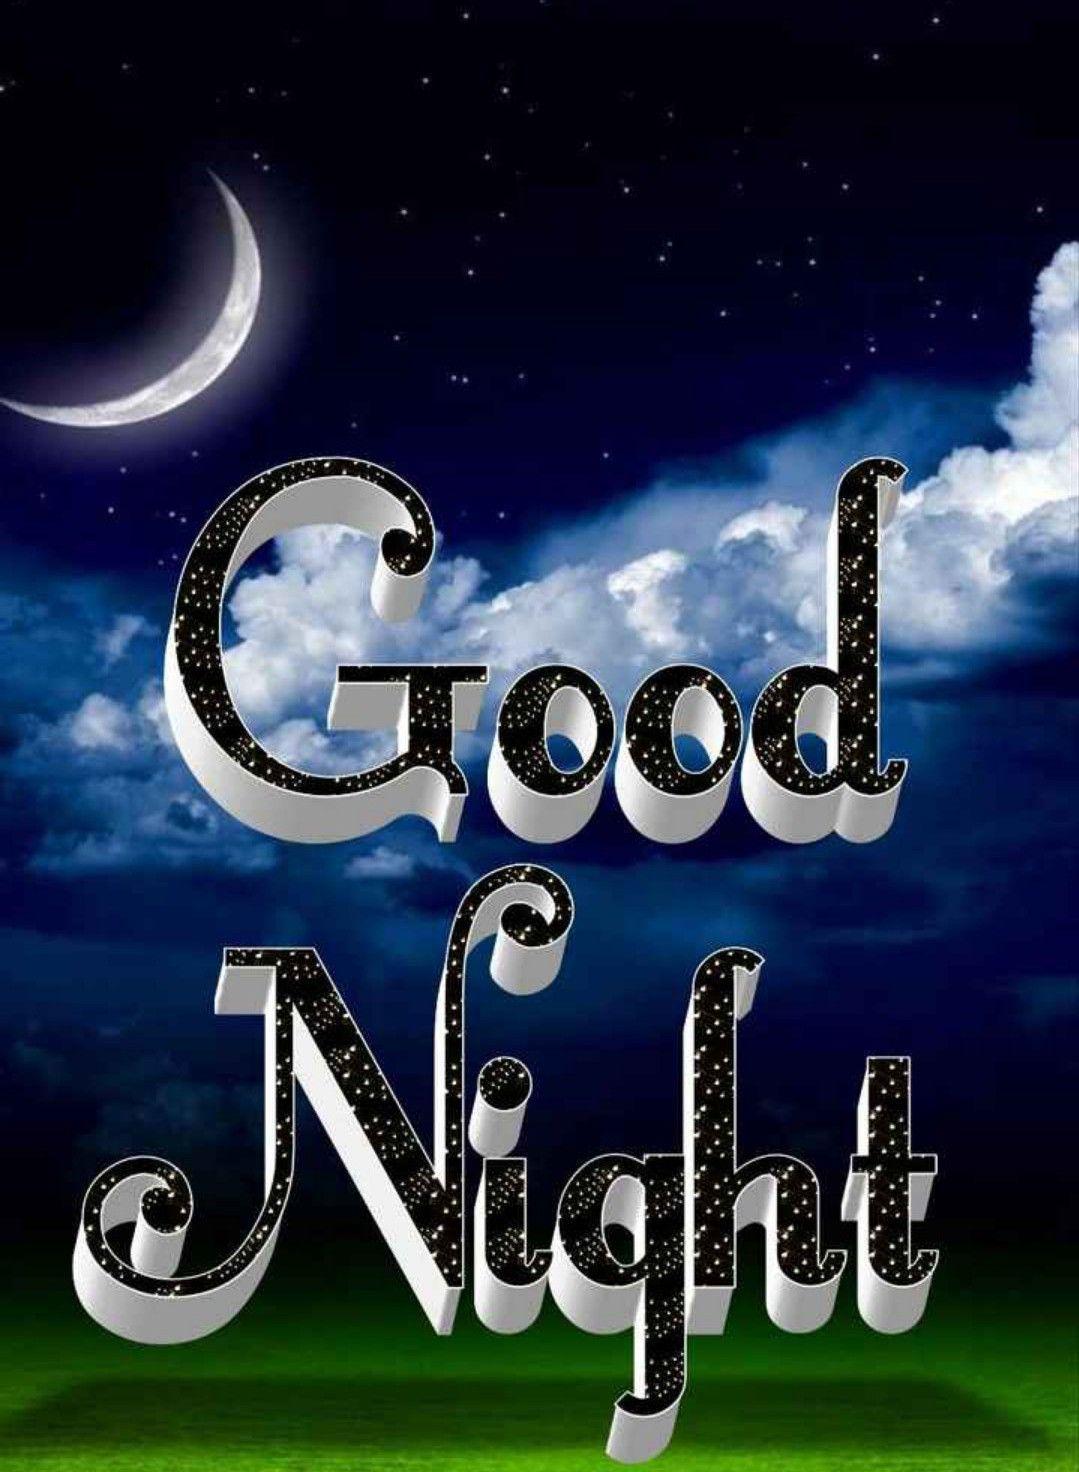 Pin On Good Night Image Sweet dreams good night images hd 1080p